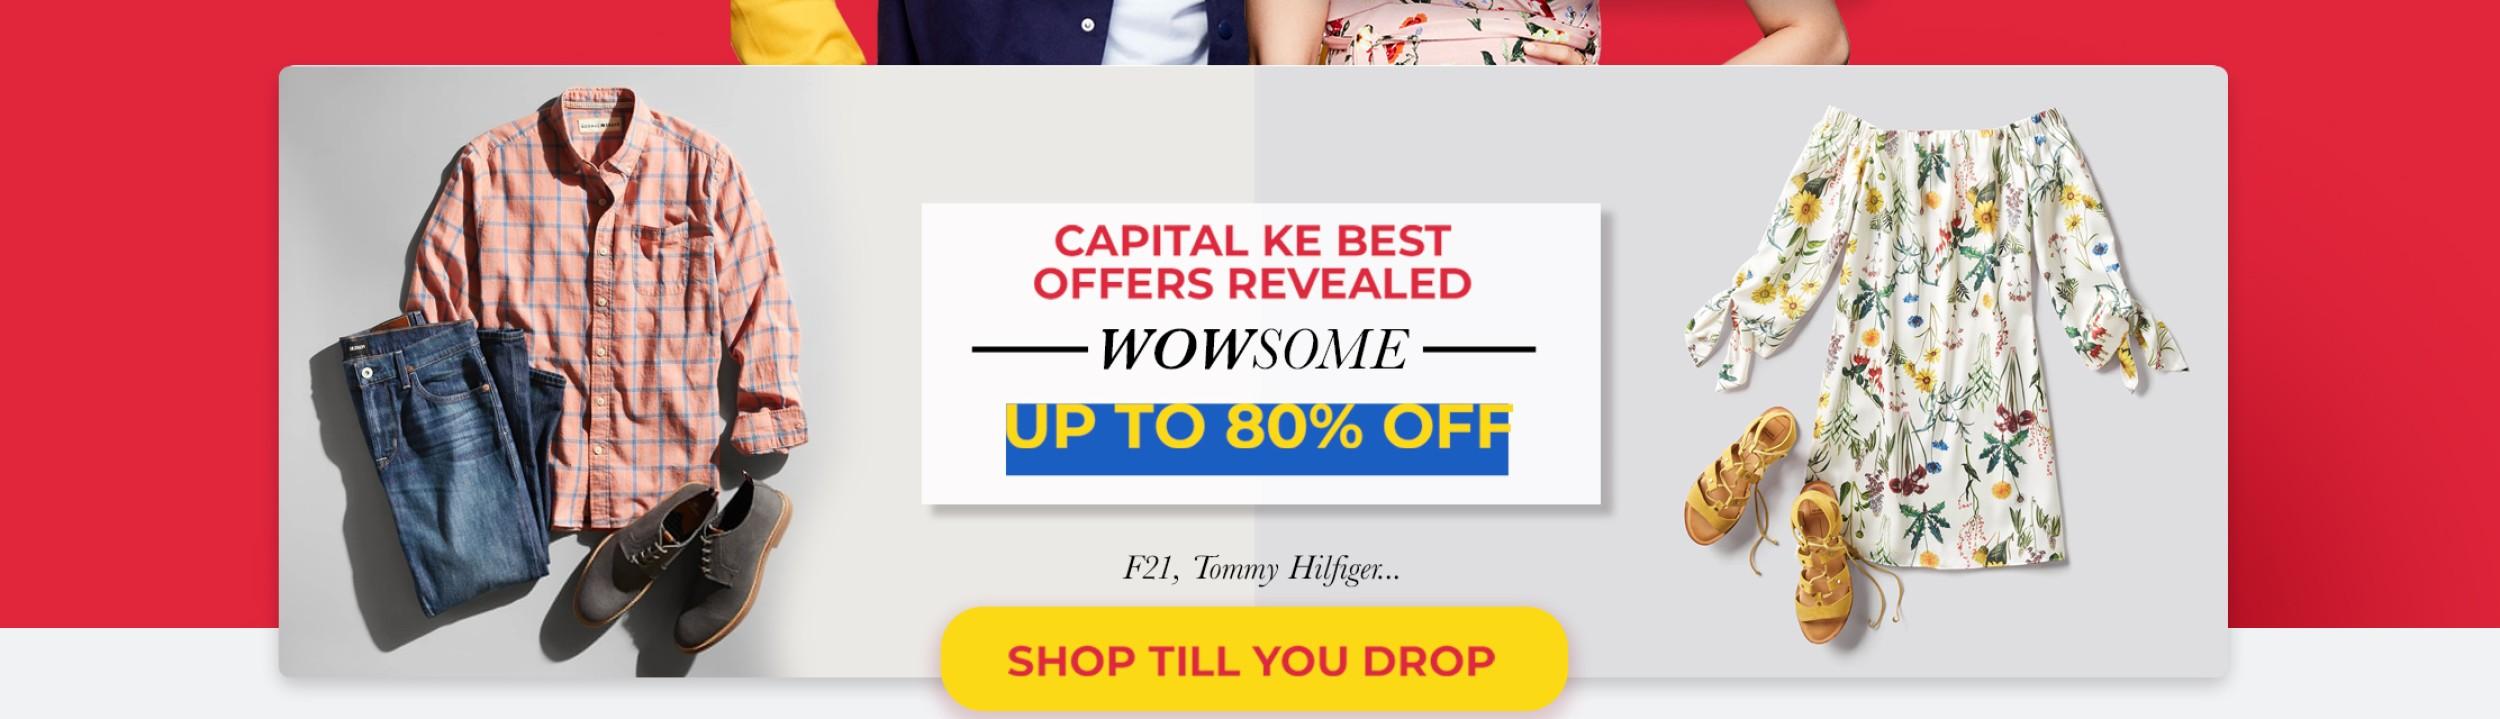 Capital fashions private limited Kedaara buys 10 stake in Manyavar; Gaja Capital, KKR to invest